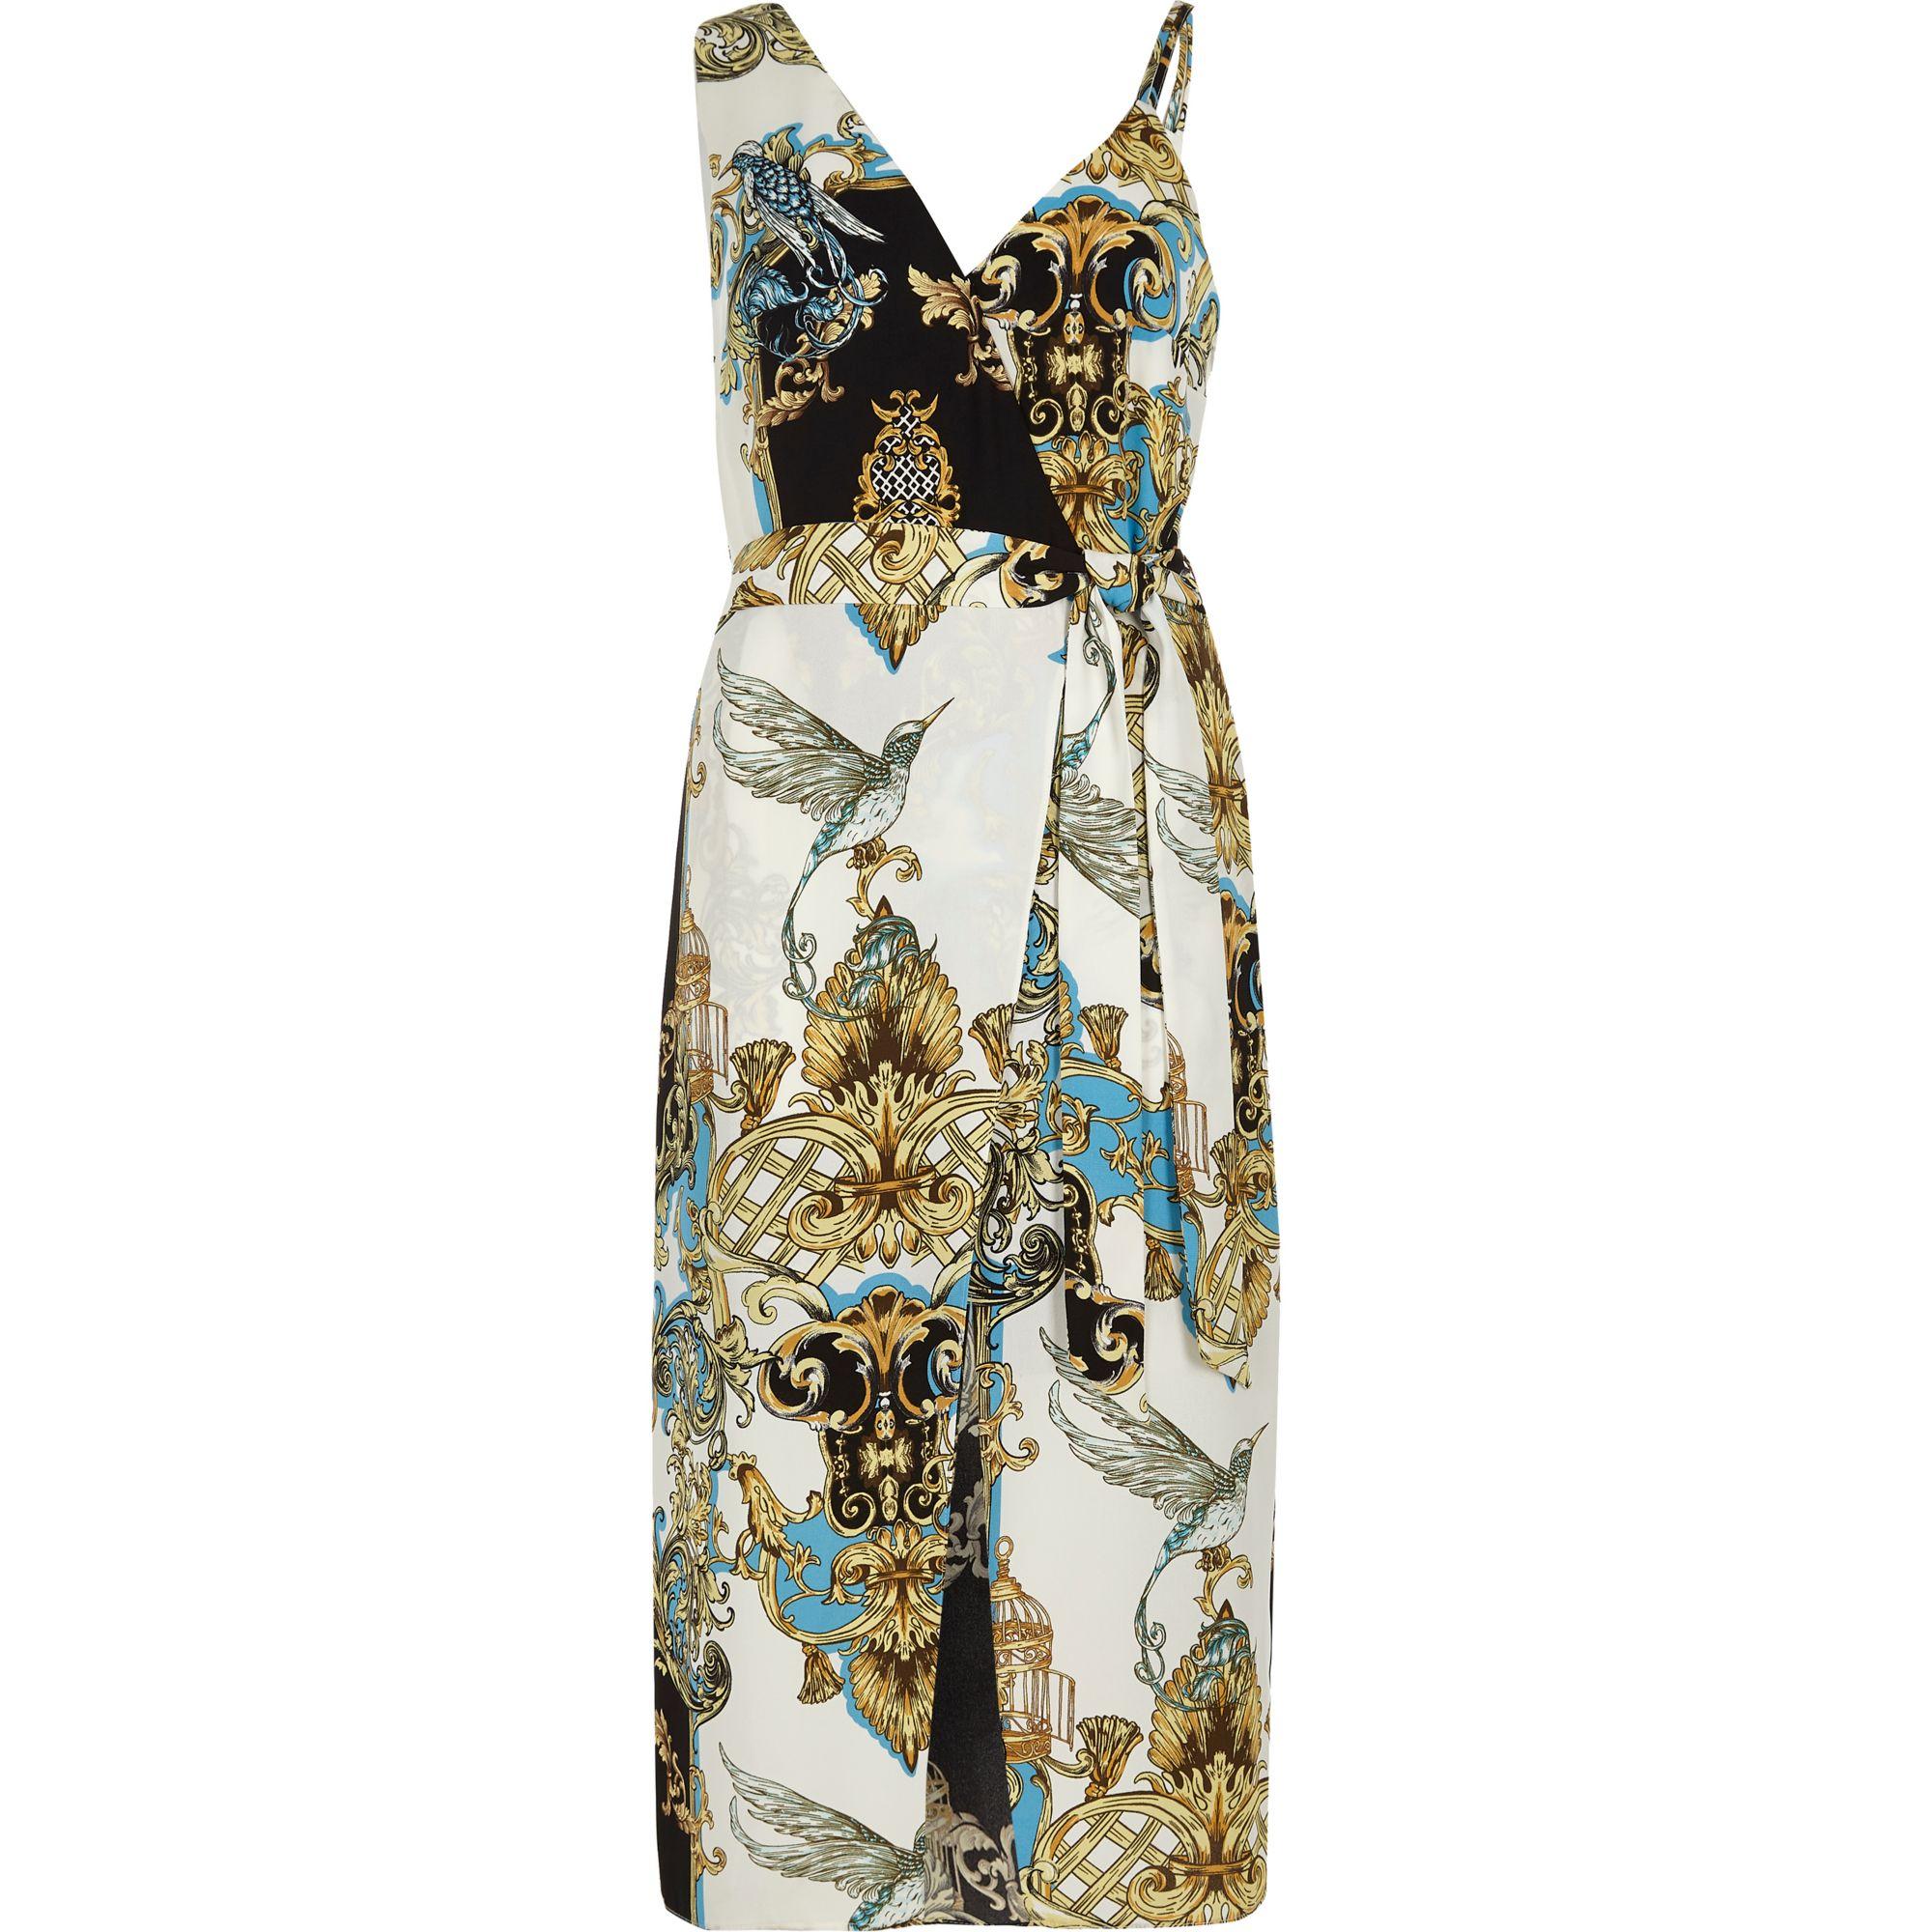 e254b67cb1 River Island Light Blue Denim Cut Out Midi Dress